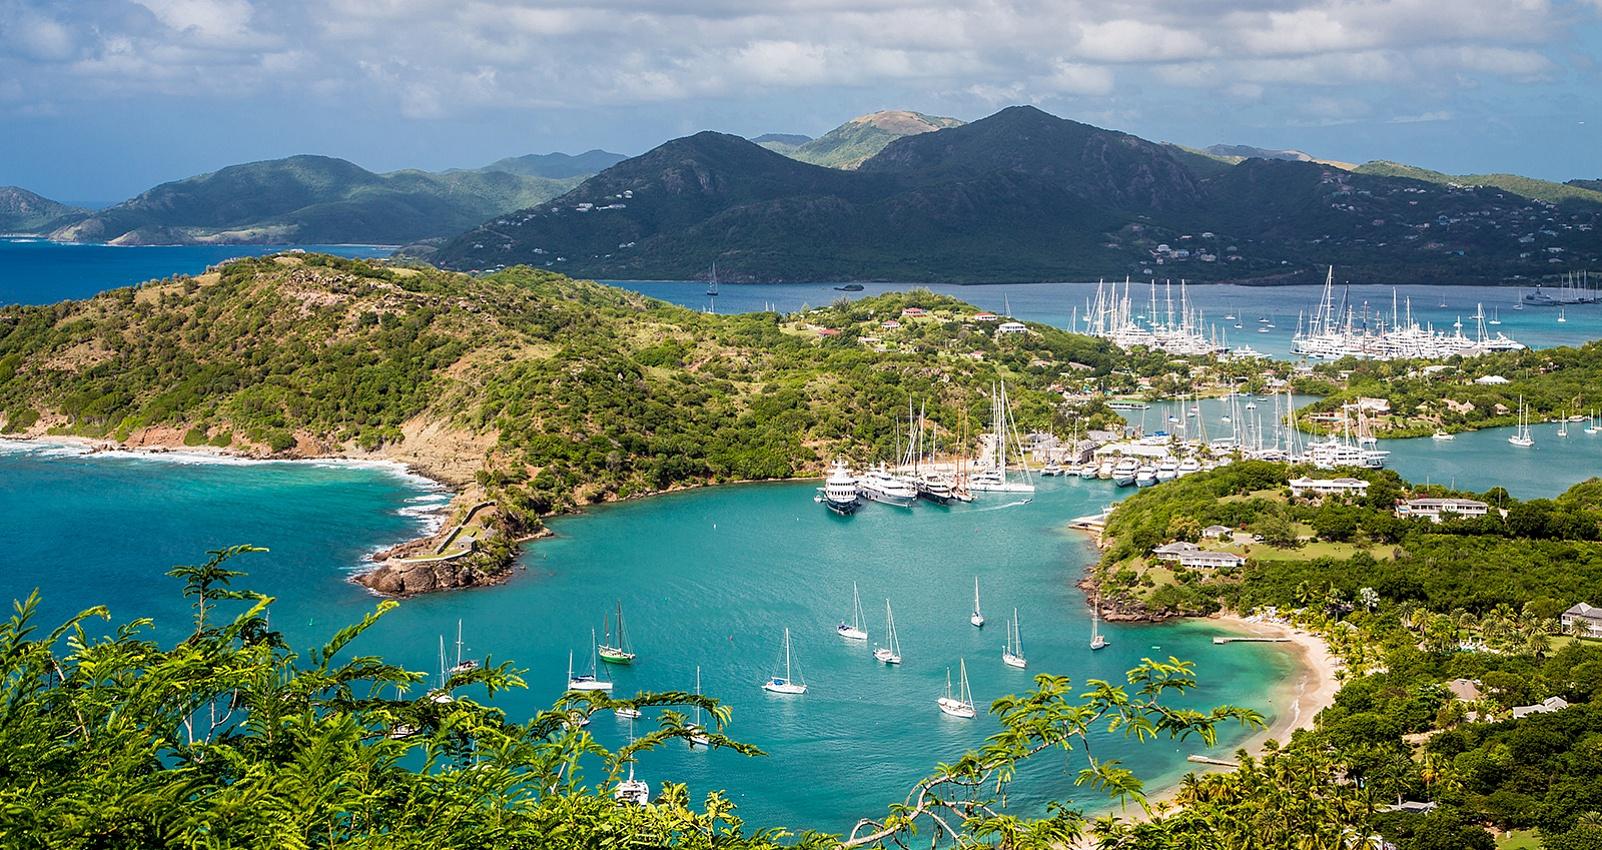 Антигуа гражданство Антигуа и Барбуда через инвестиции в недвижимость